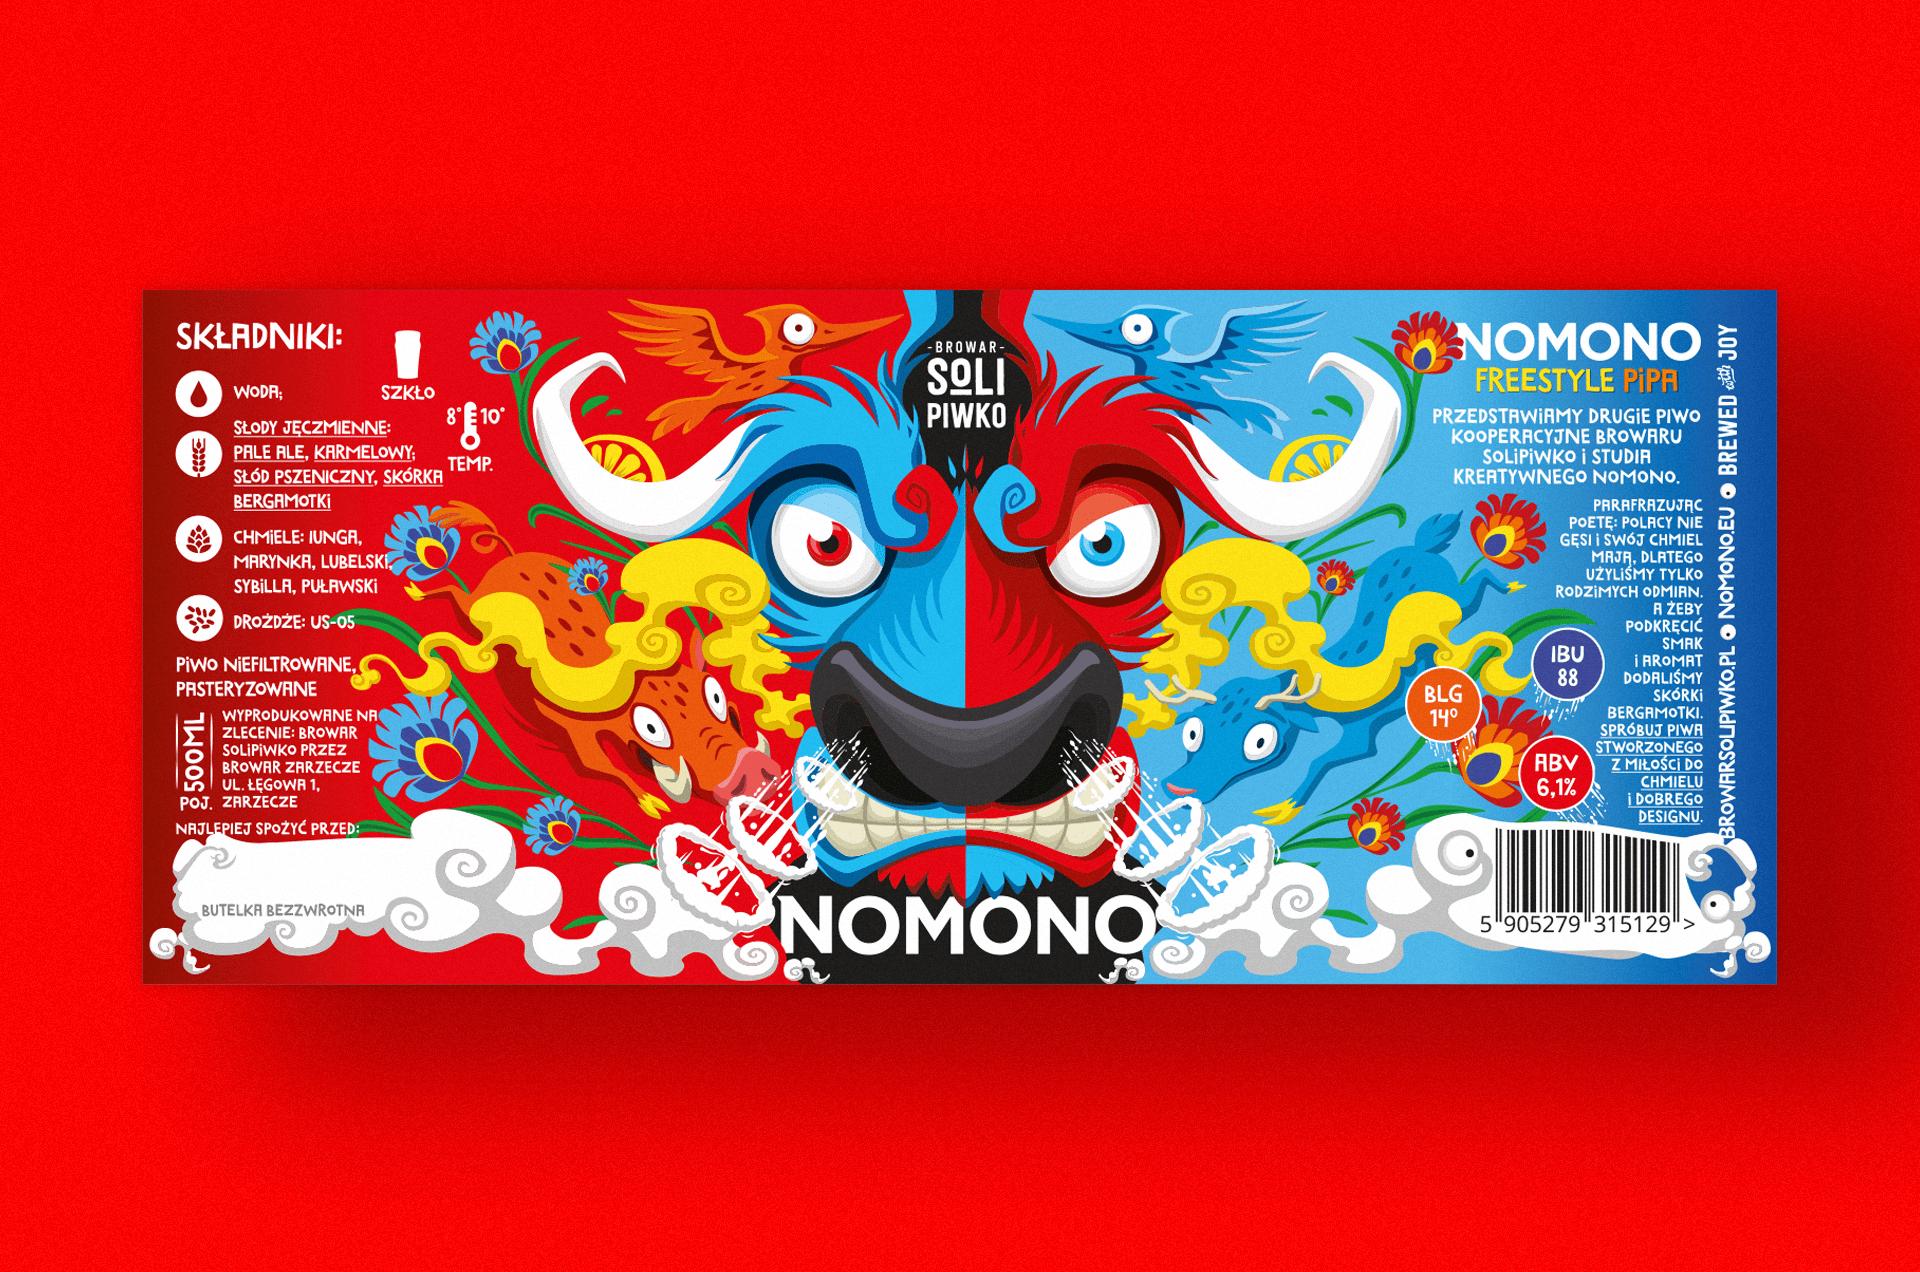 3. NOMONO-Freestyle-PIPA-Label